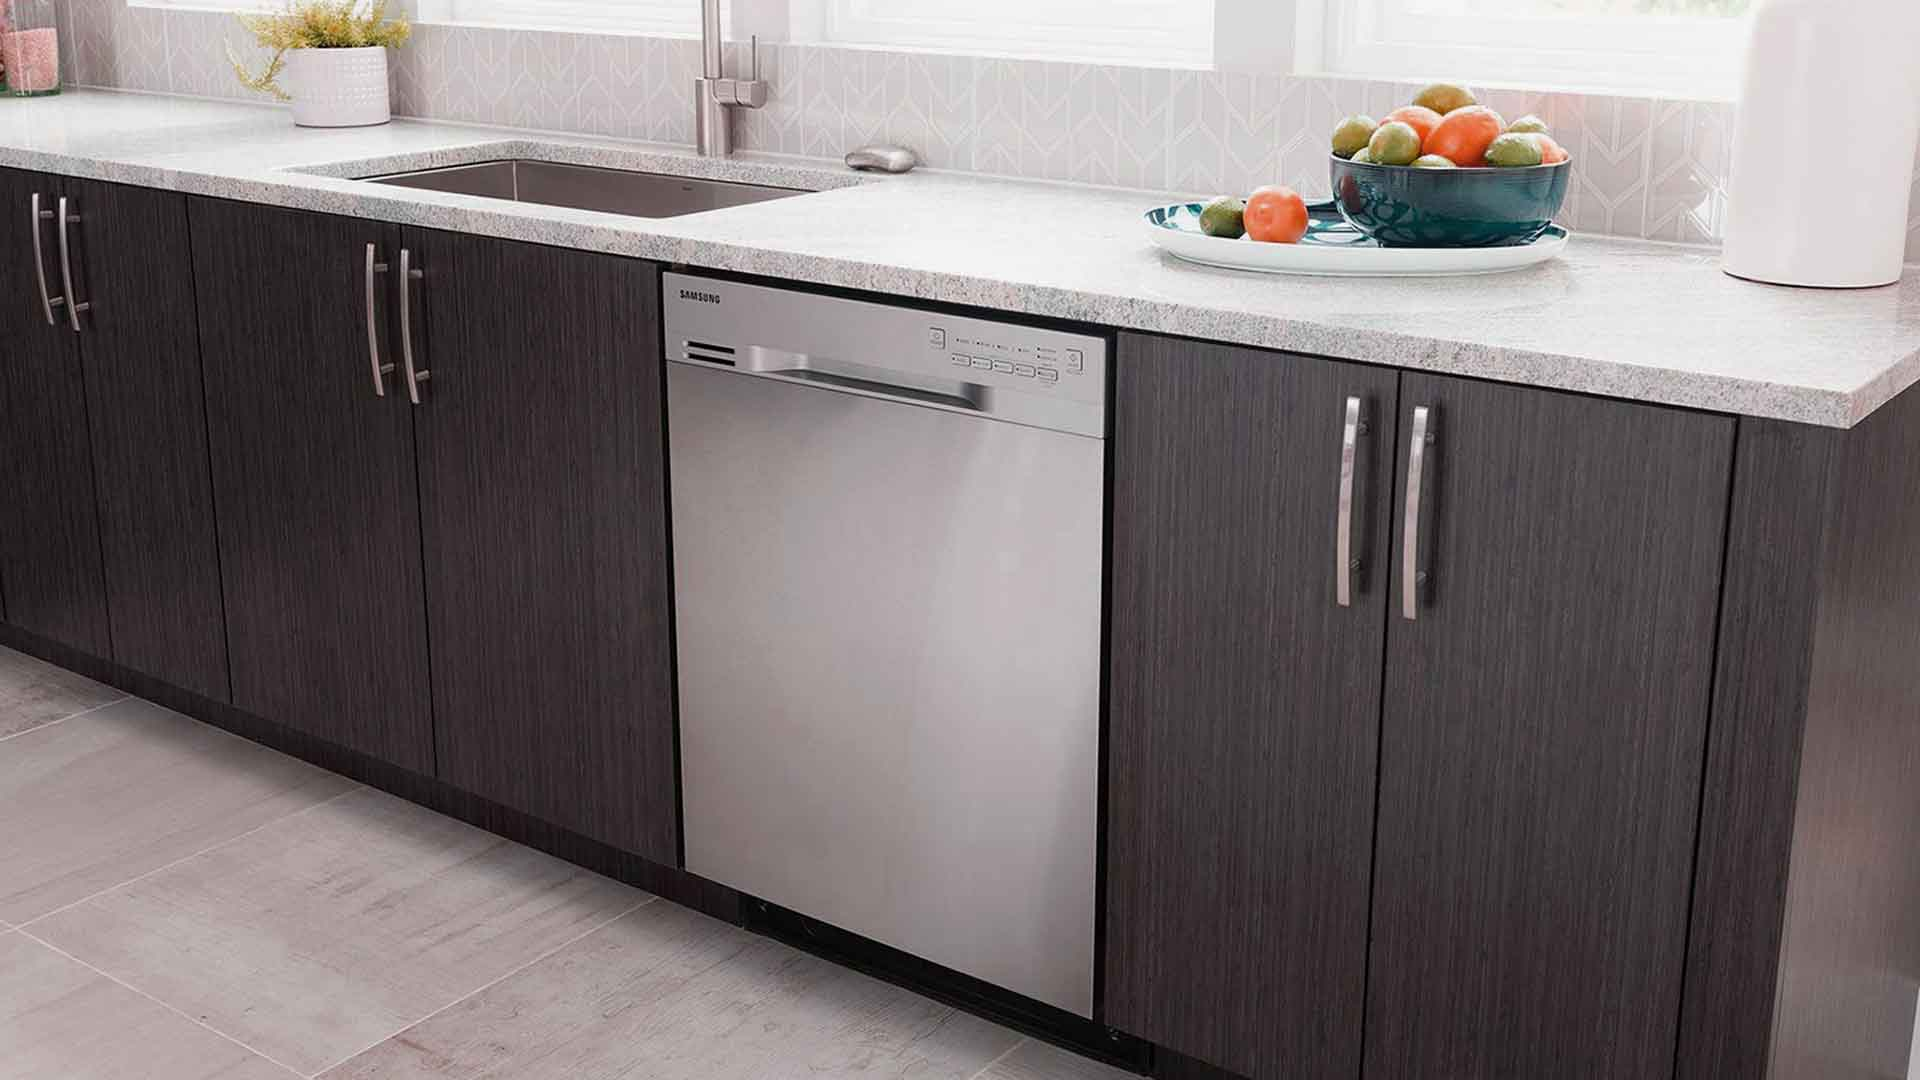 Samsung Rotary Dishwasher Repair | Samsung Appliance Repair